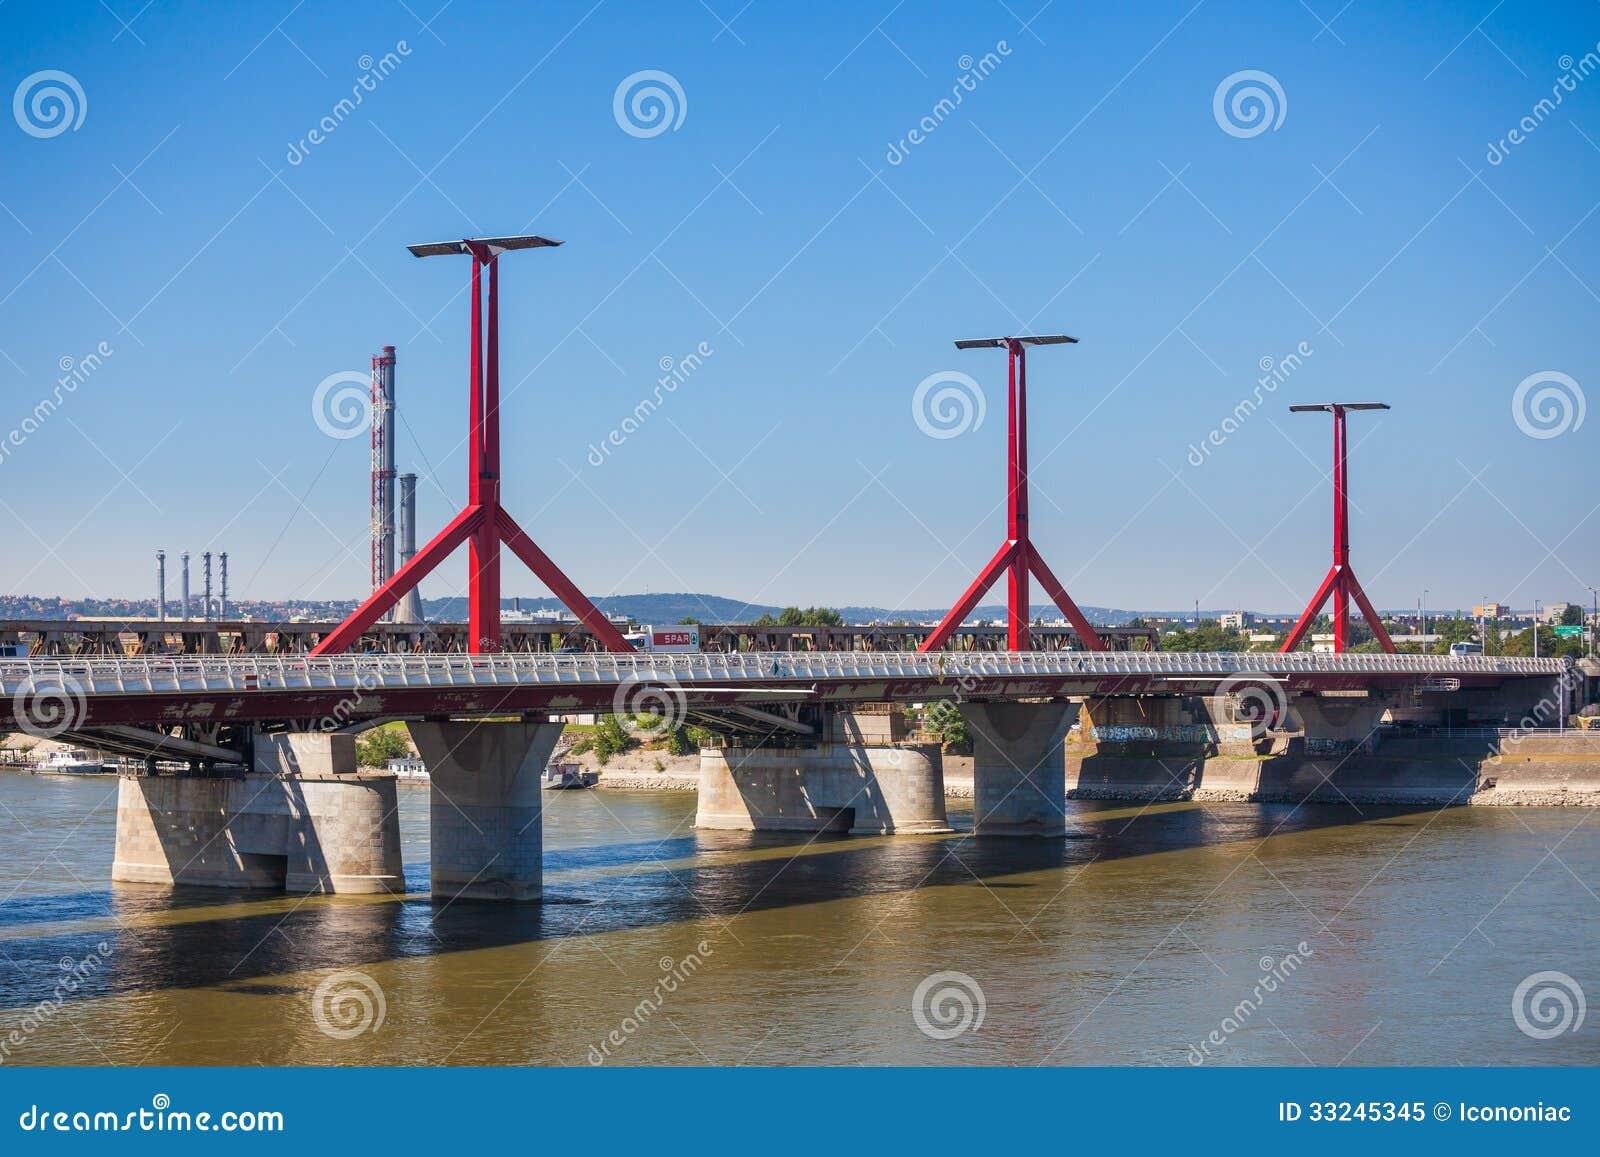 Rakoczi Bridge Pillars From Budapest Royalty Free Stock